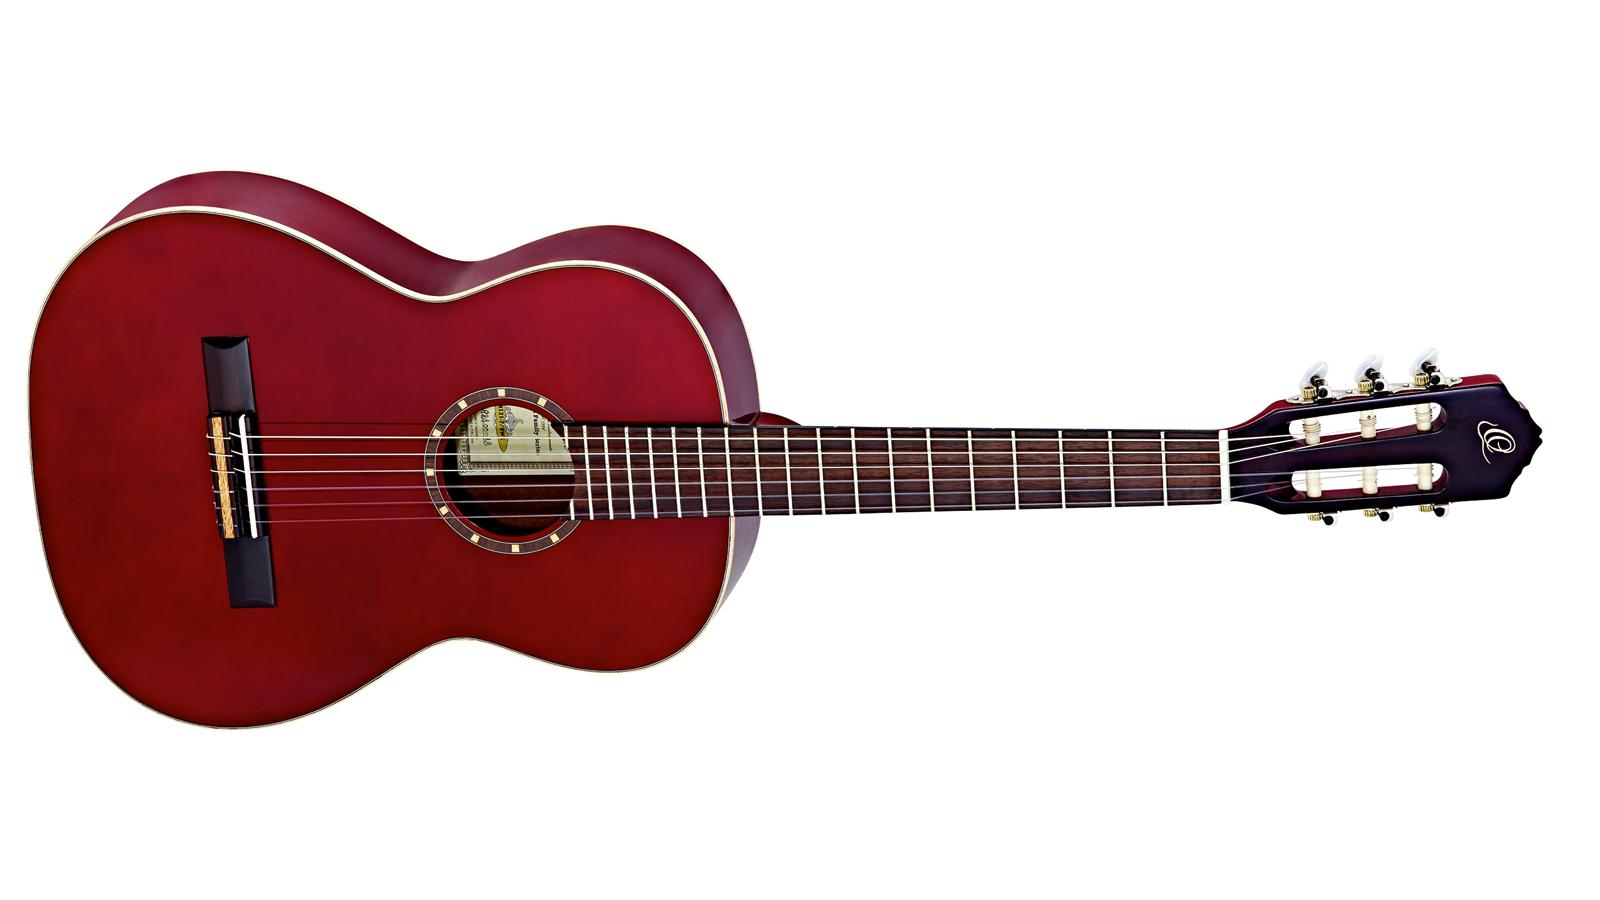 Ortega R121 WR Konzertgitarre 7/8